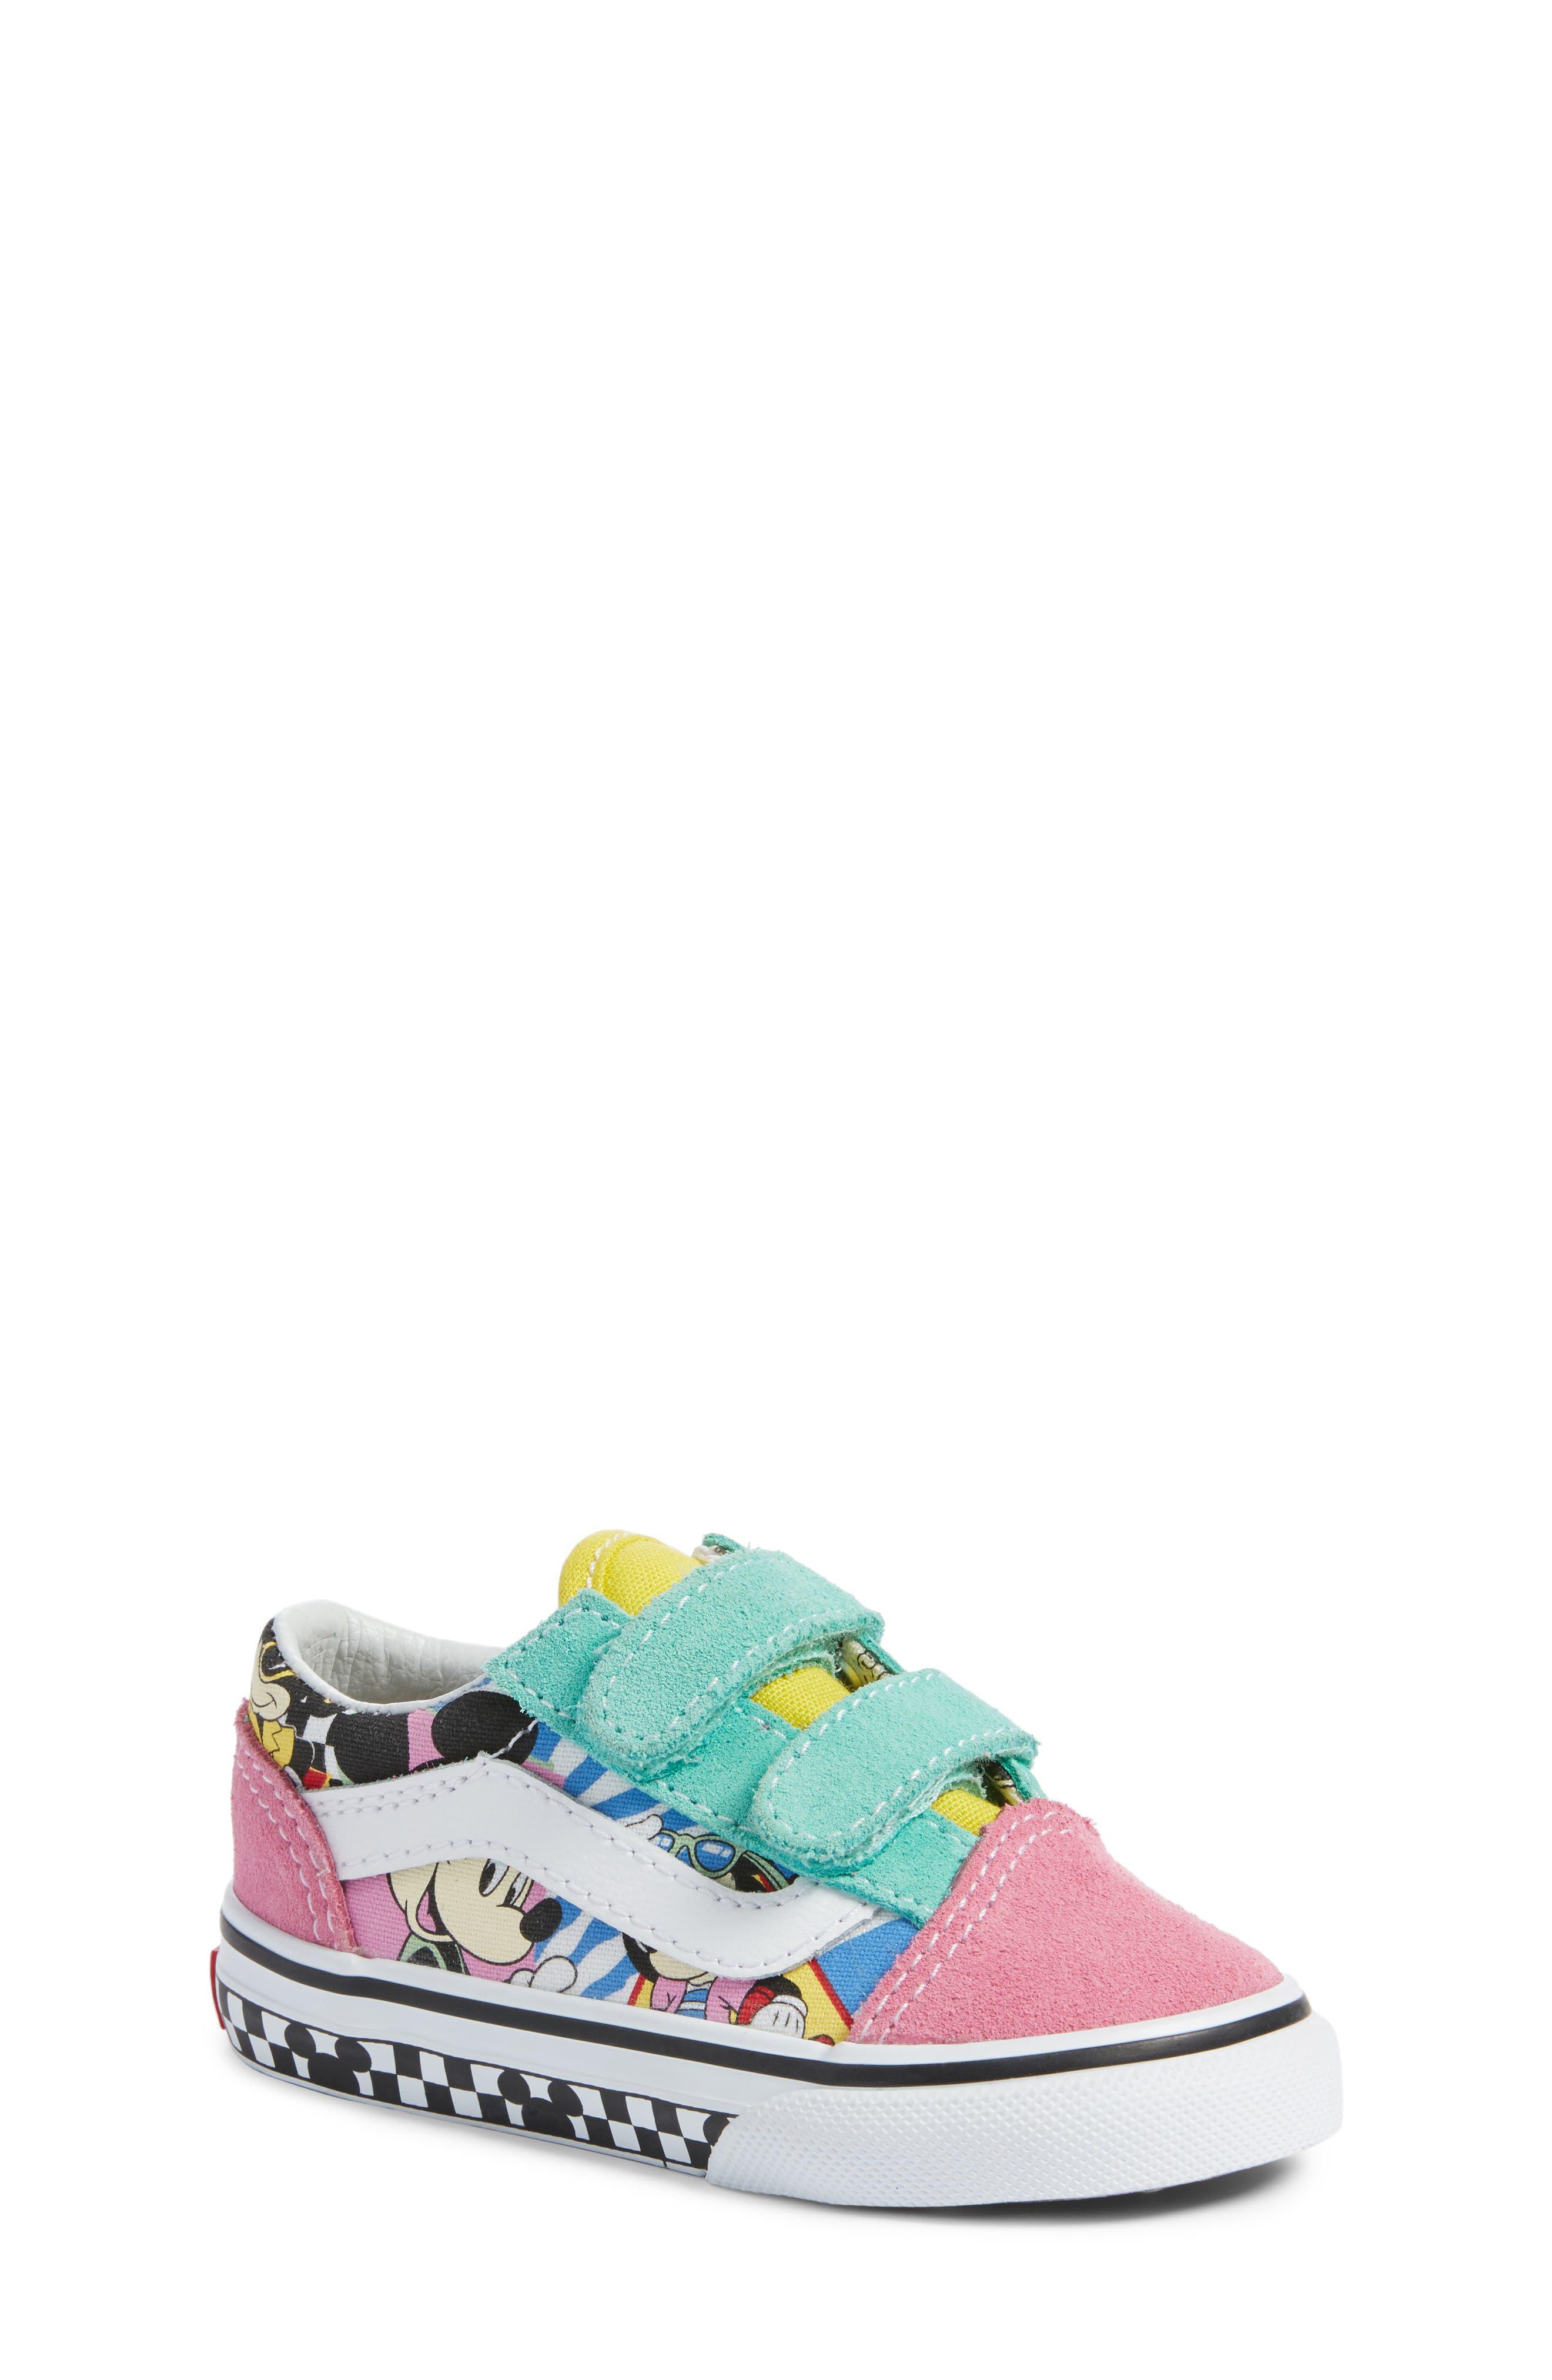 VANS, x Disney Old Skool V Sneaker, Main thumbnail 1, color, 650